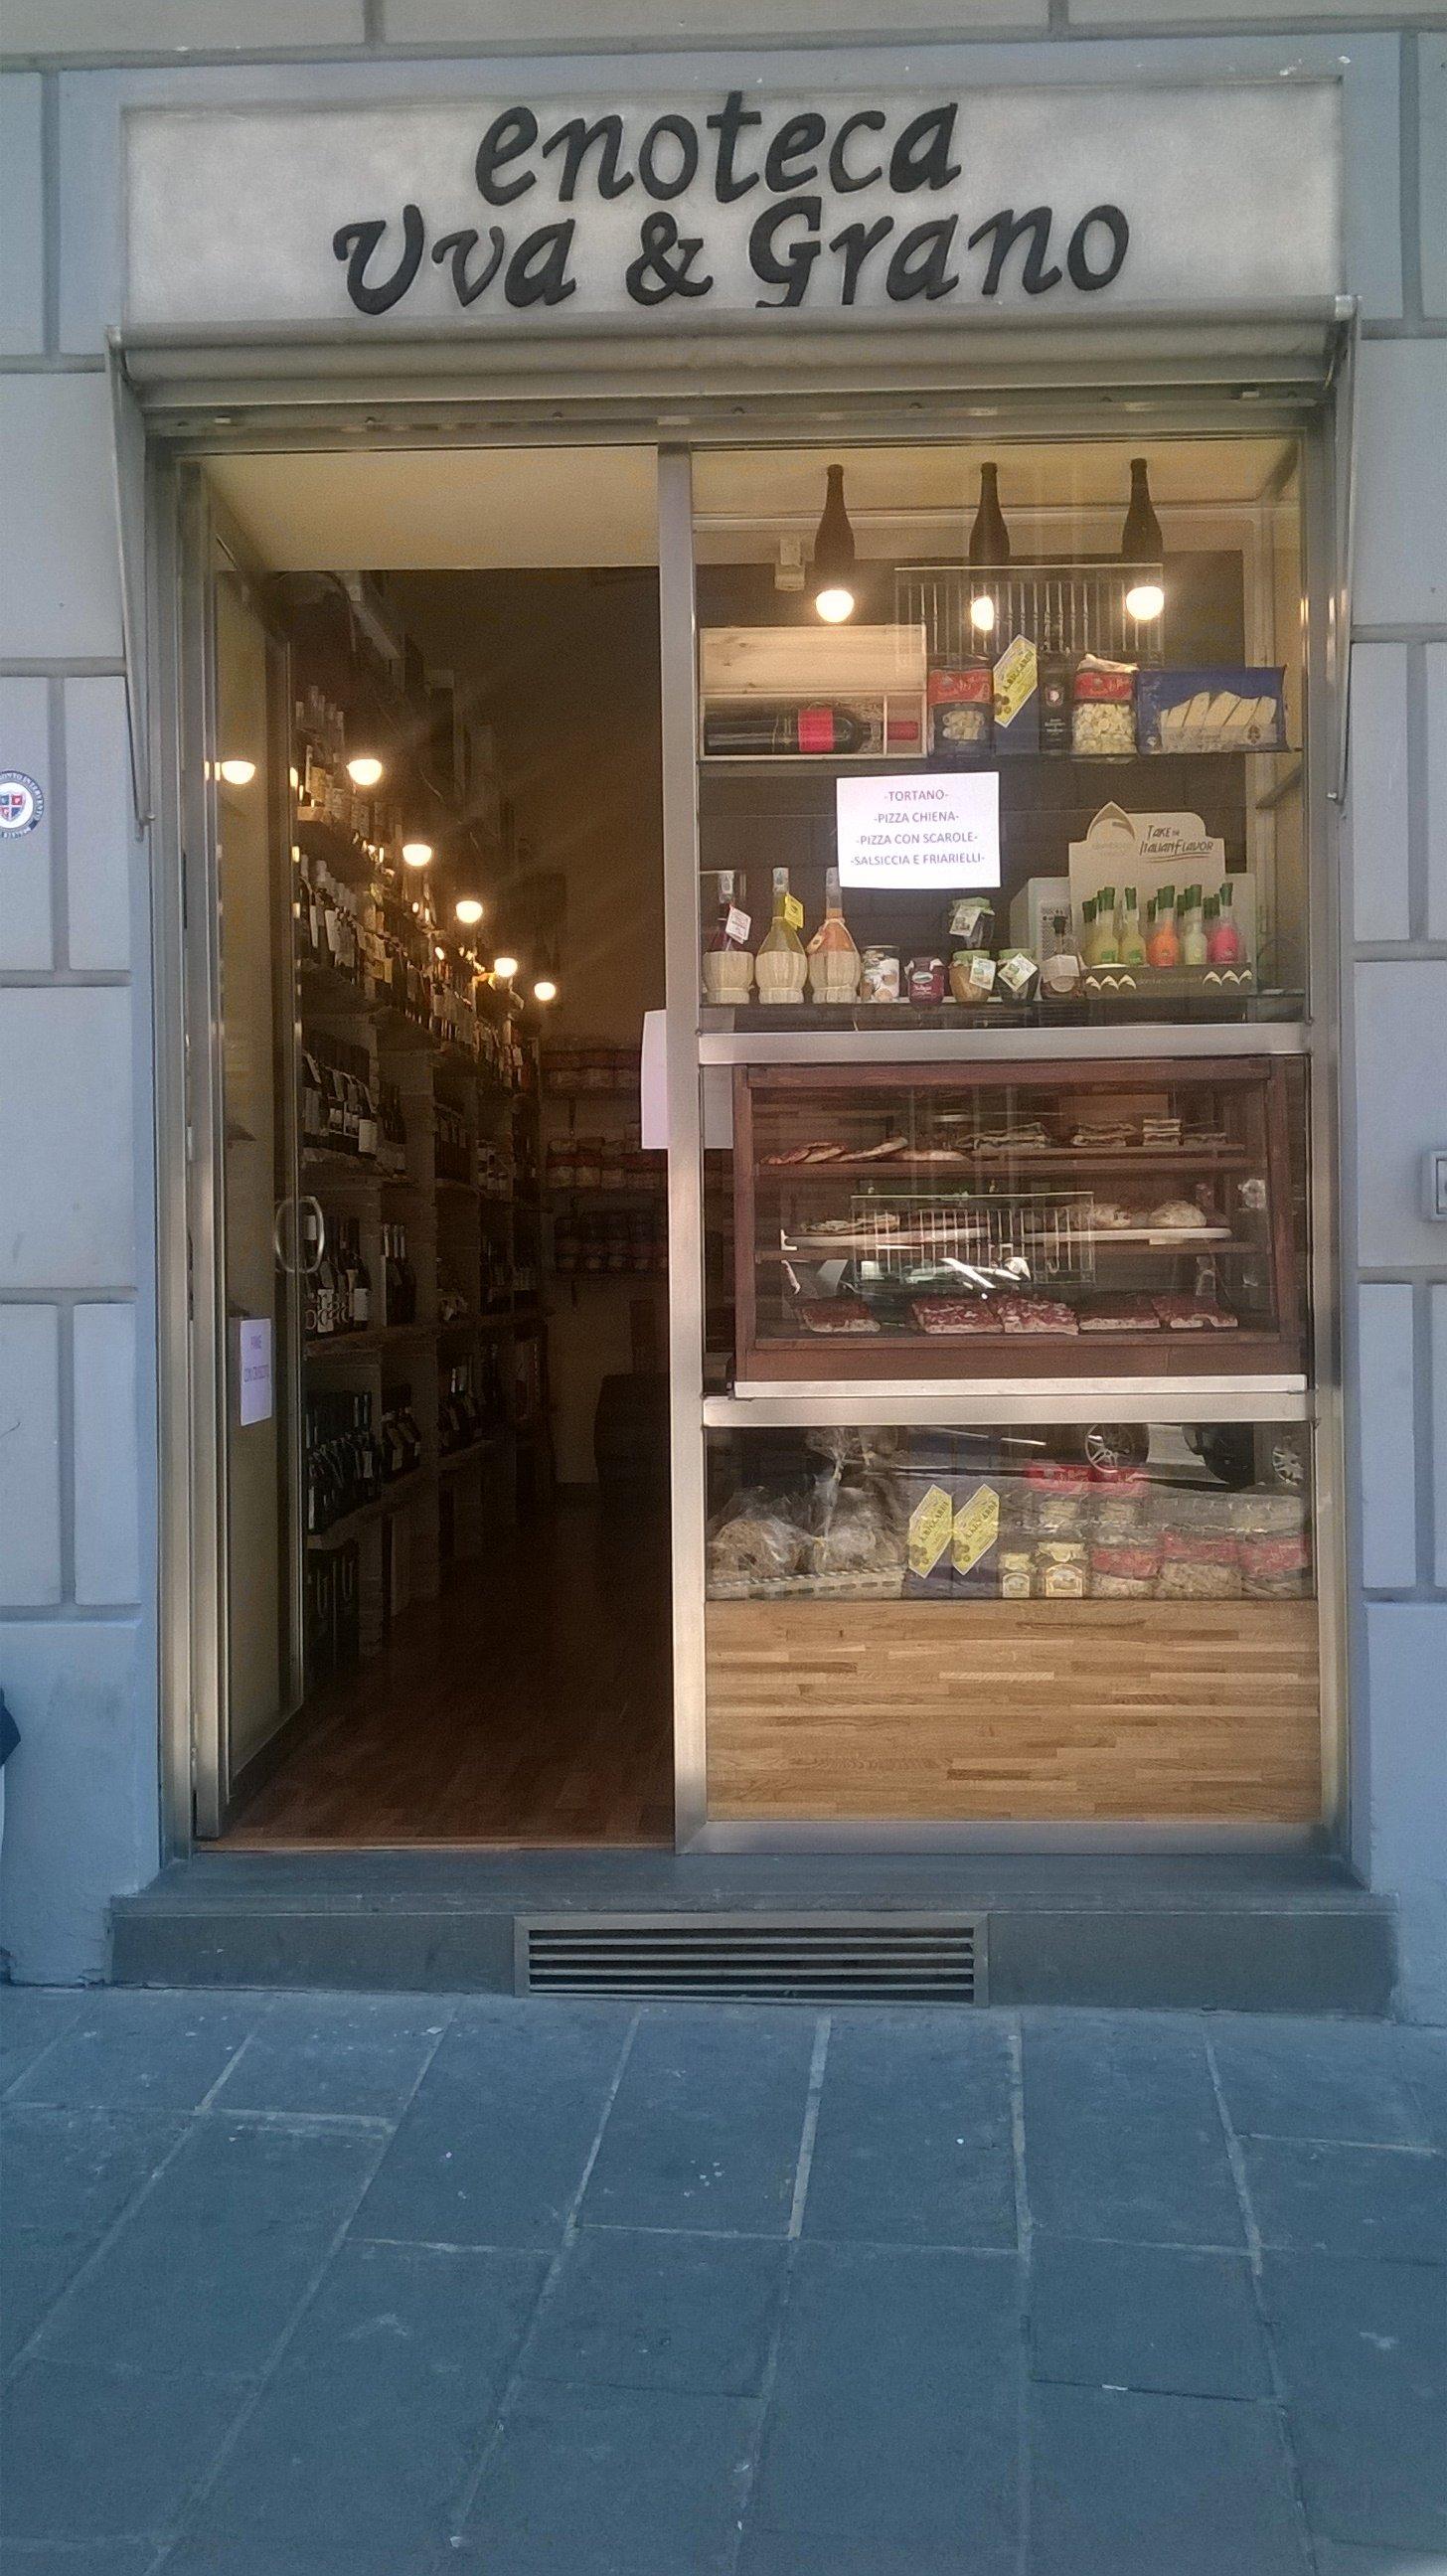 Enoteca Uva & Grano Pessina, Napoli